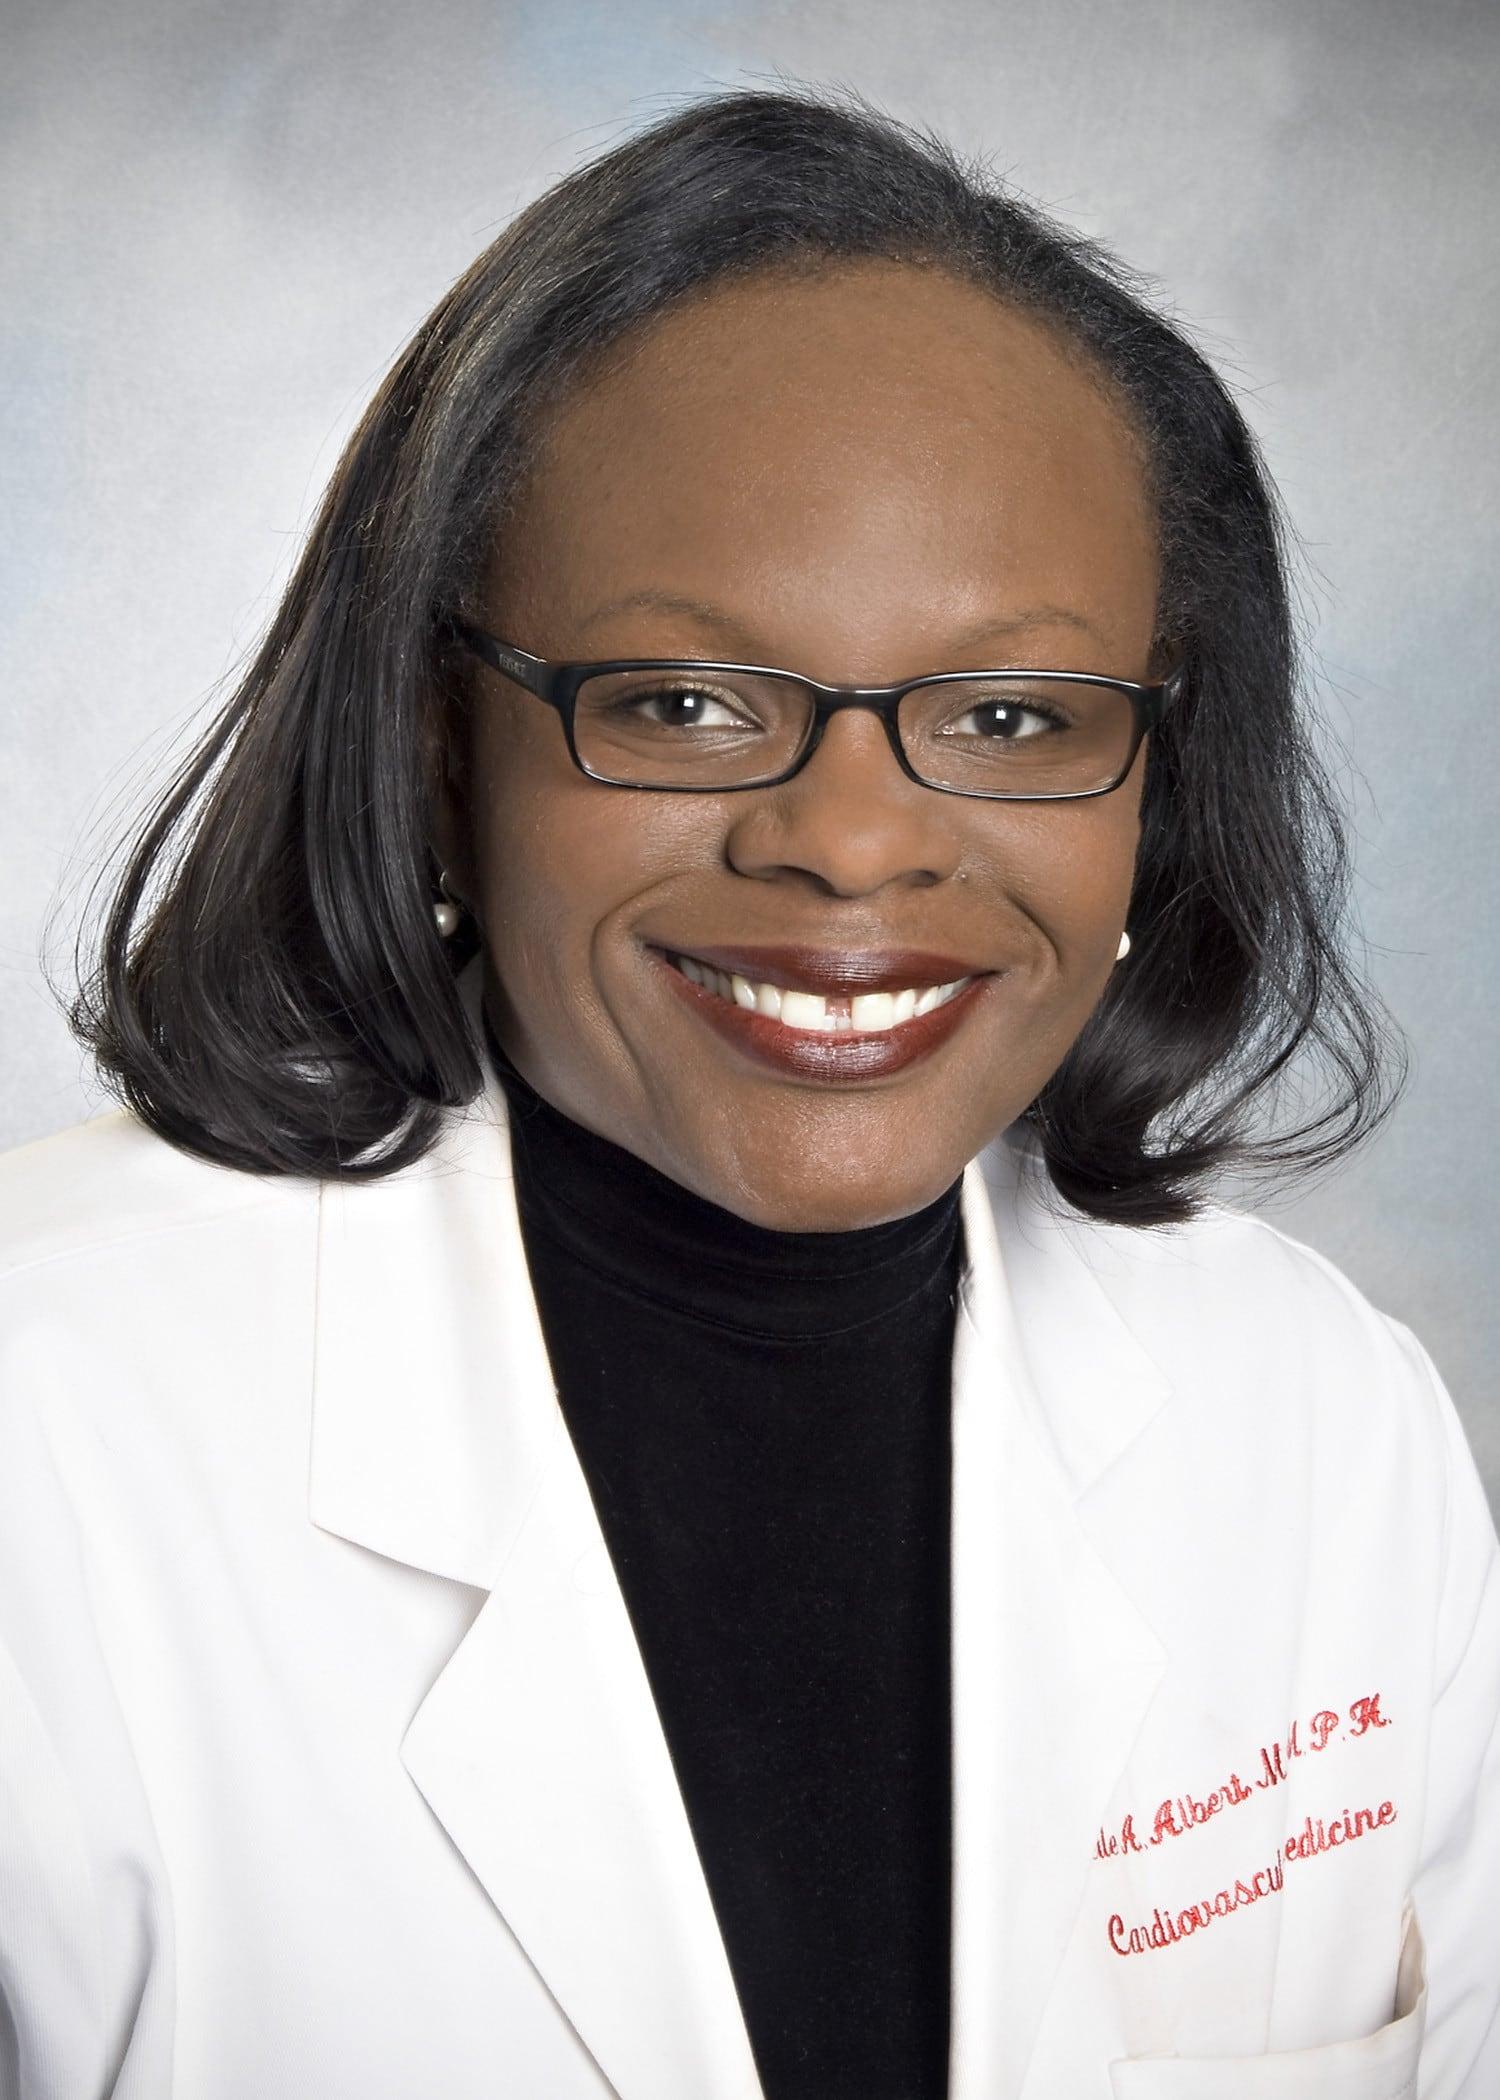 Fierce Adviser Wins Award for Heart Disease Research